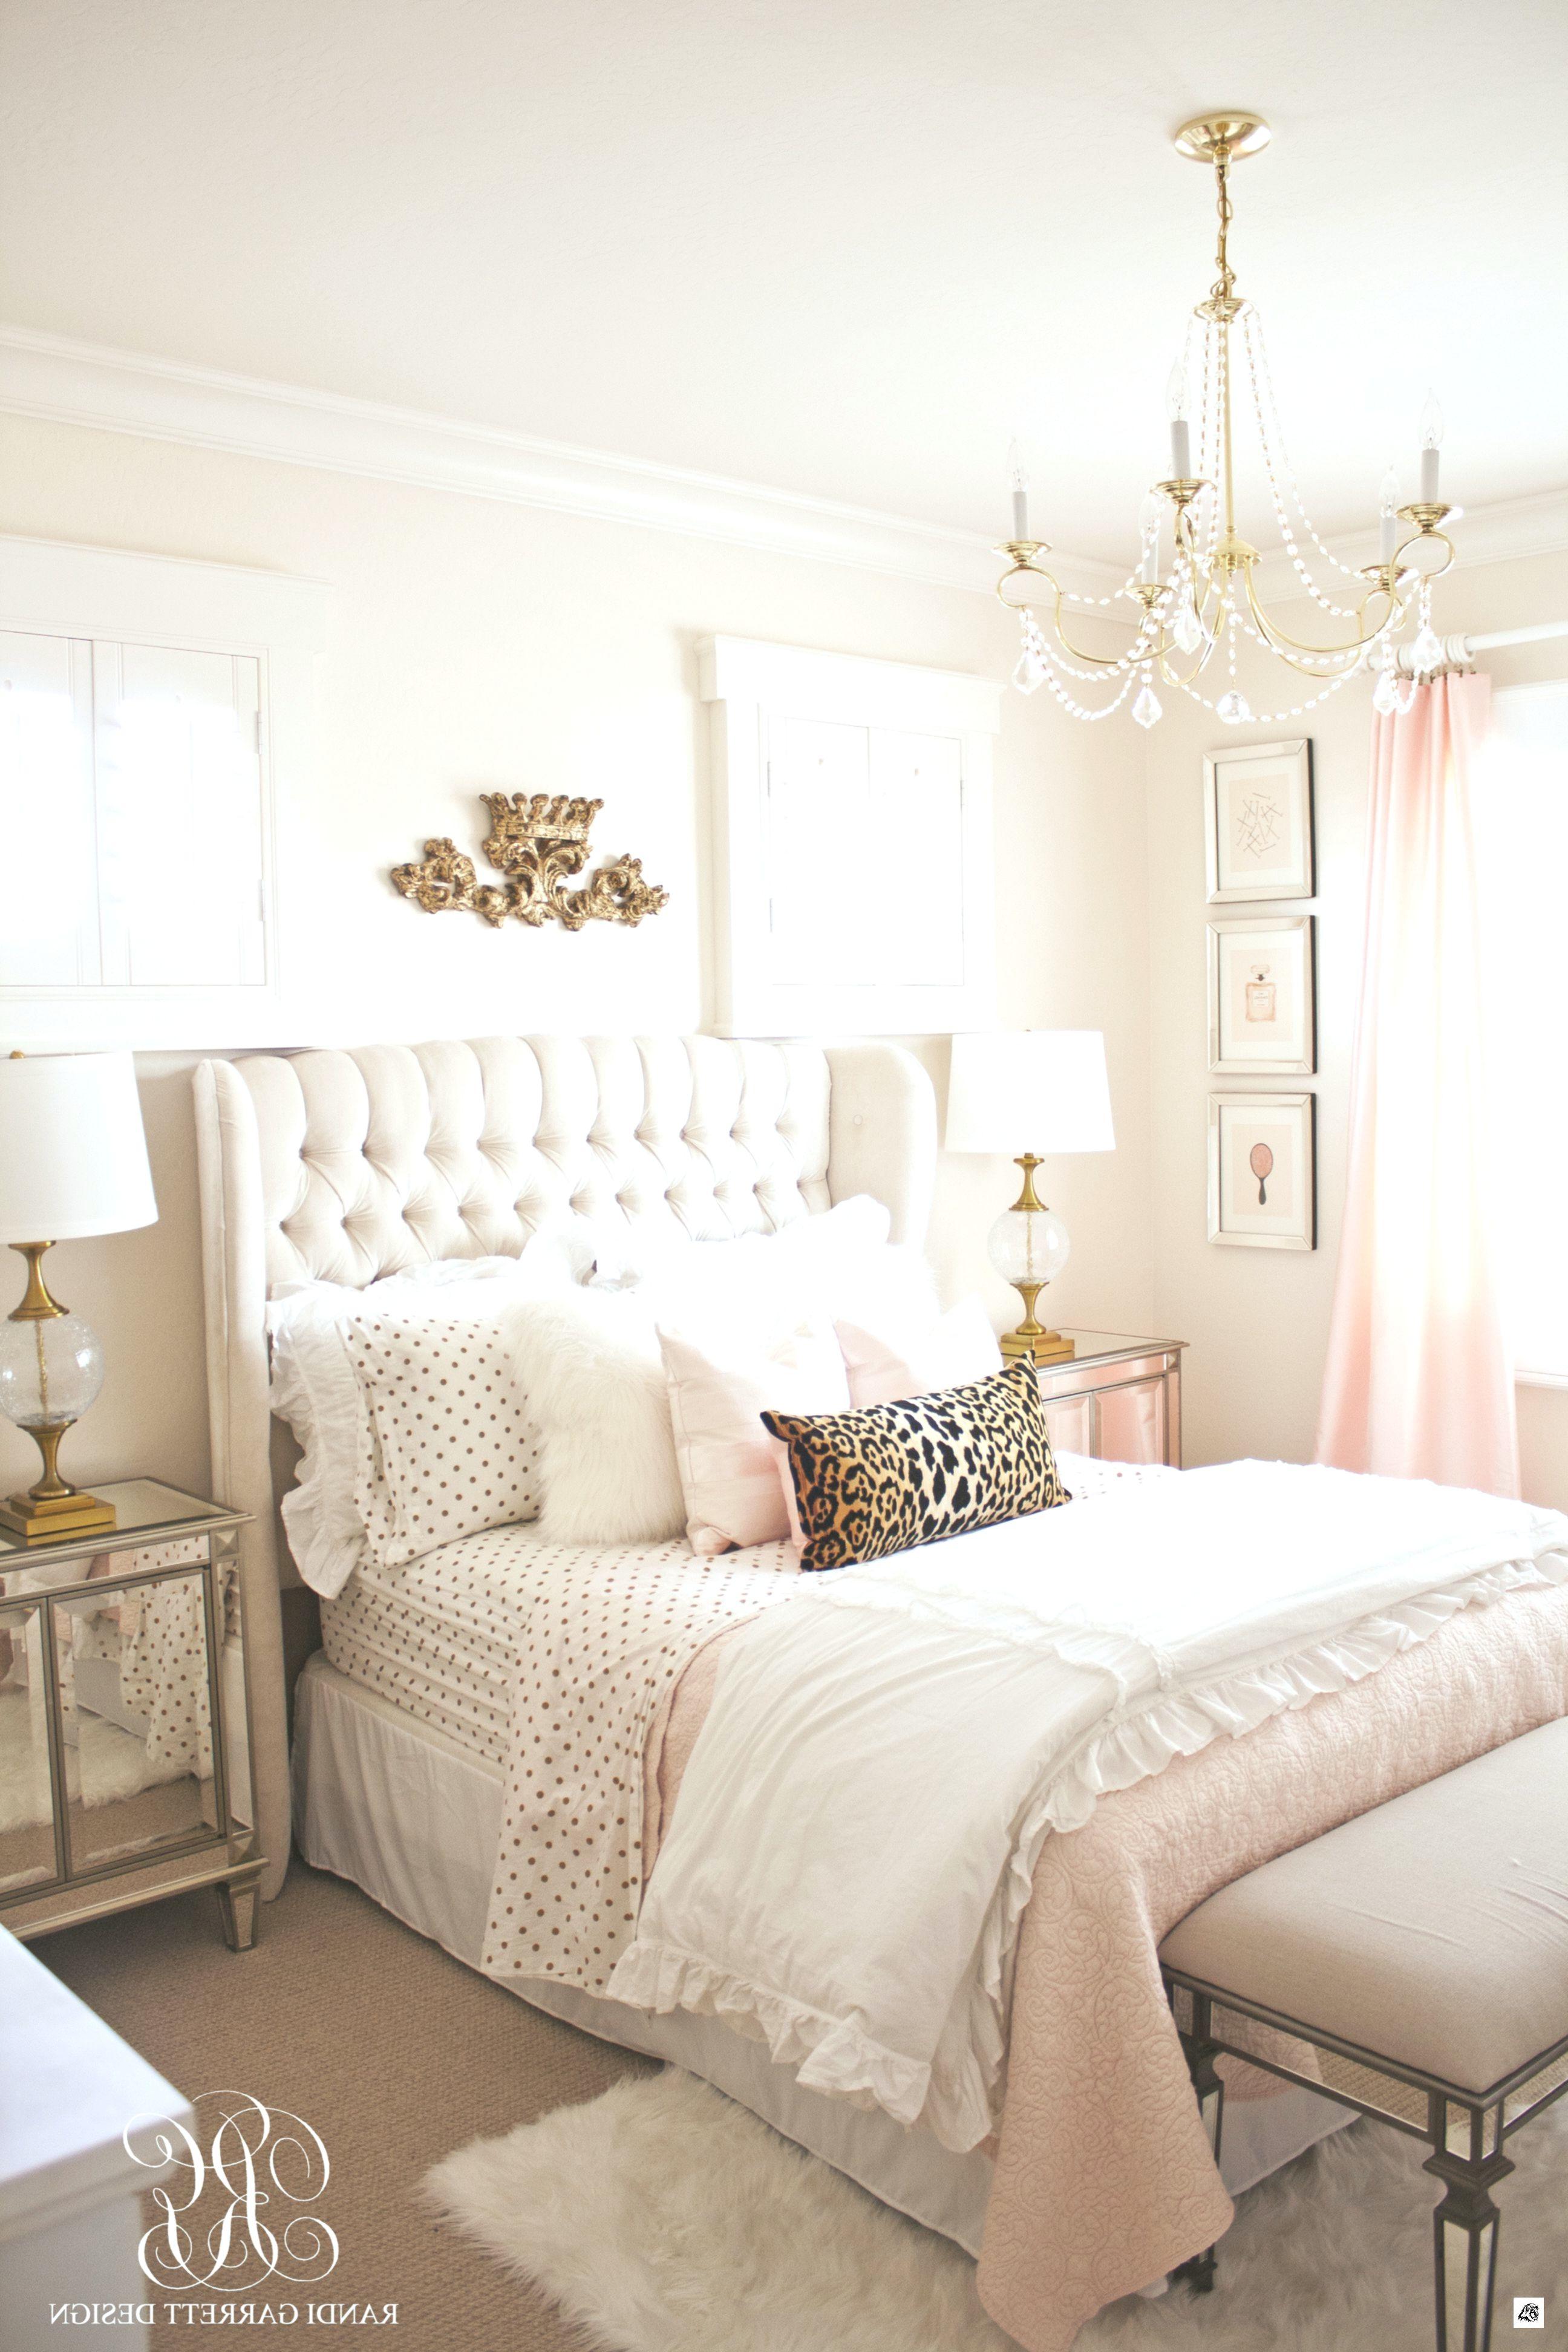 22 Decor For Bedroom Amazing Bedroom Ideas 2019 Bedroom Modella Club Bedroom Decor Gold Bedroom Bedroom Interior Beige bedroom decorating ideas